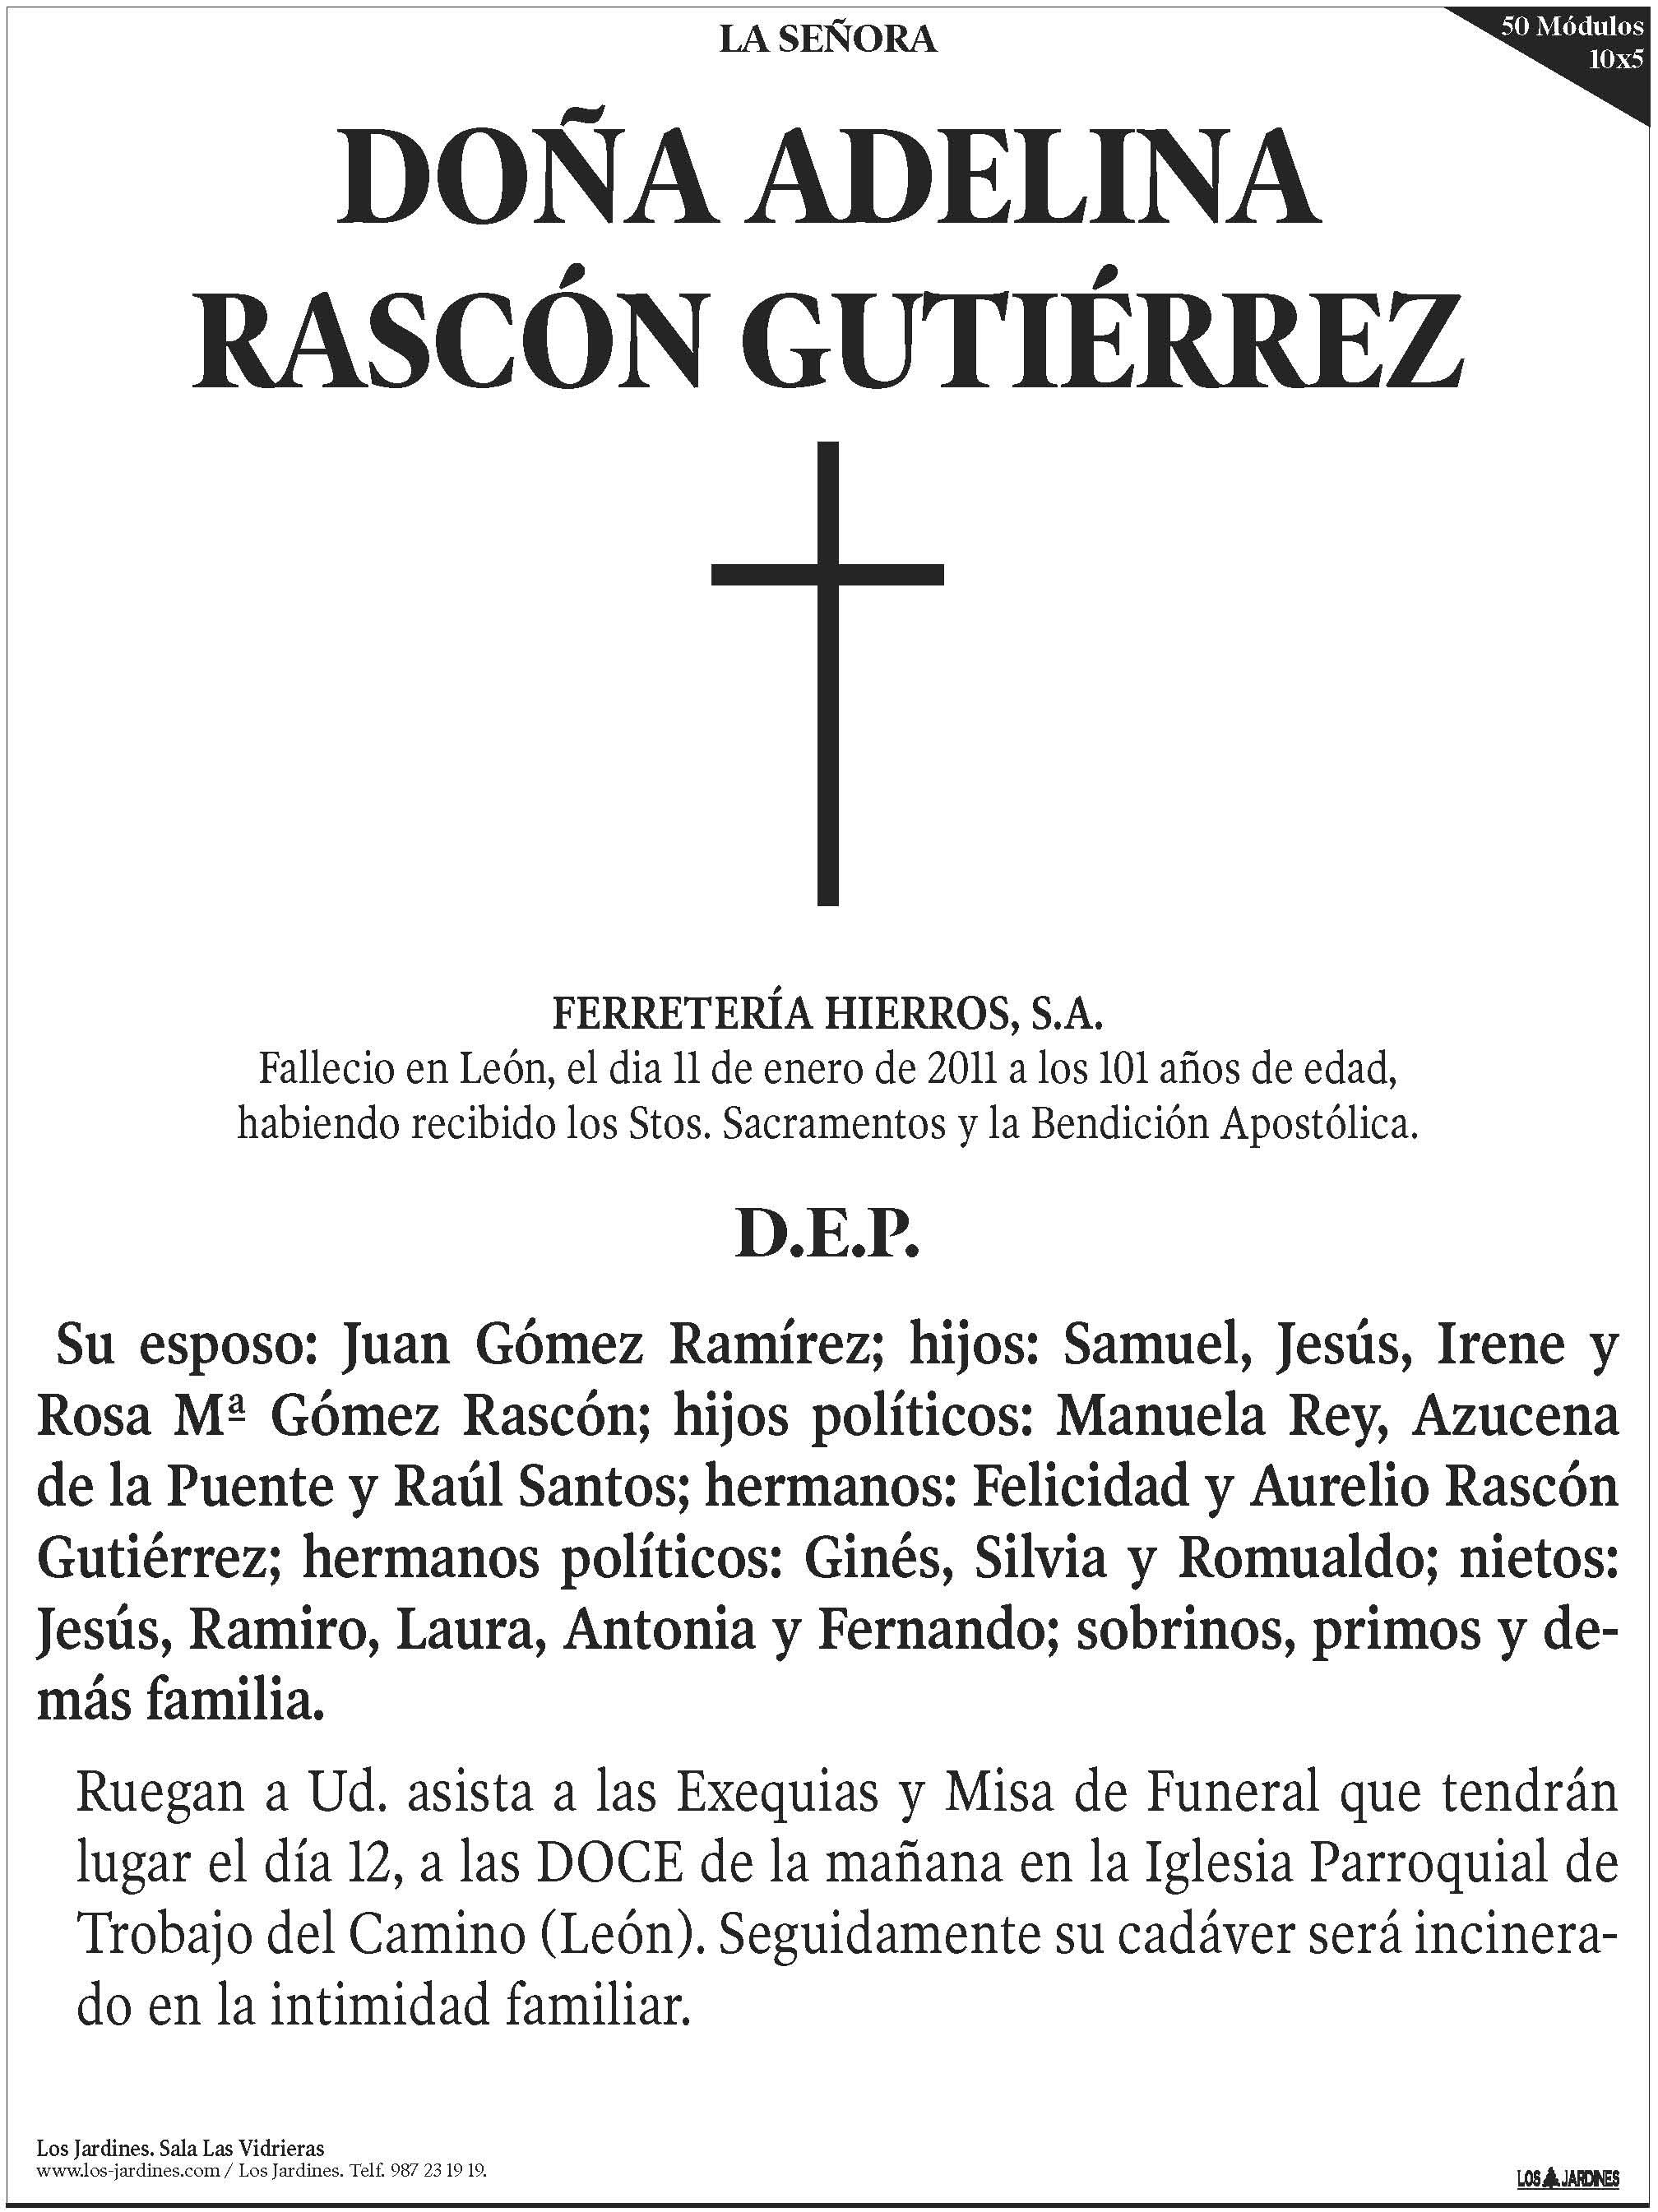 Diario de León - página completa, Esquelas Diario de León